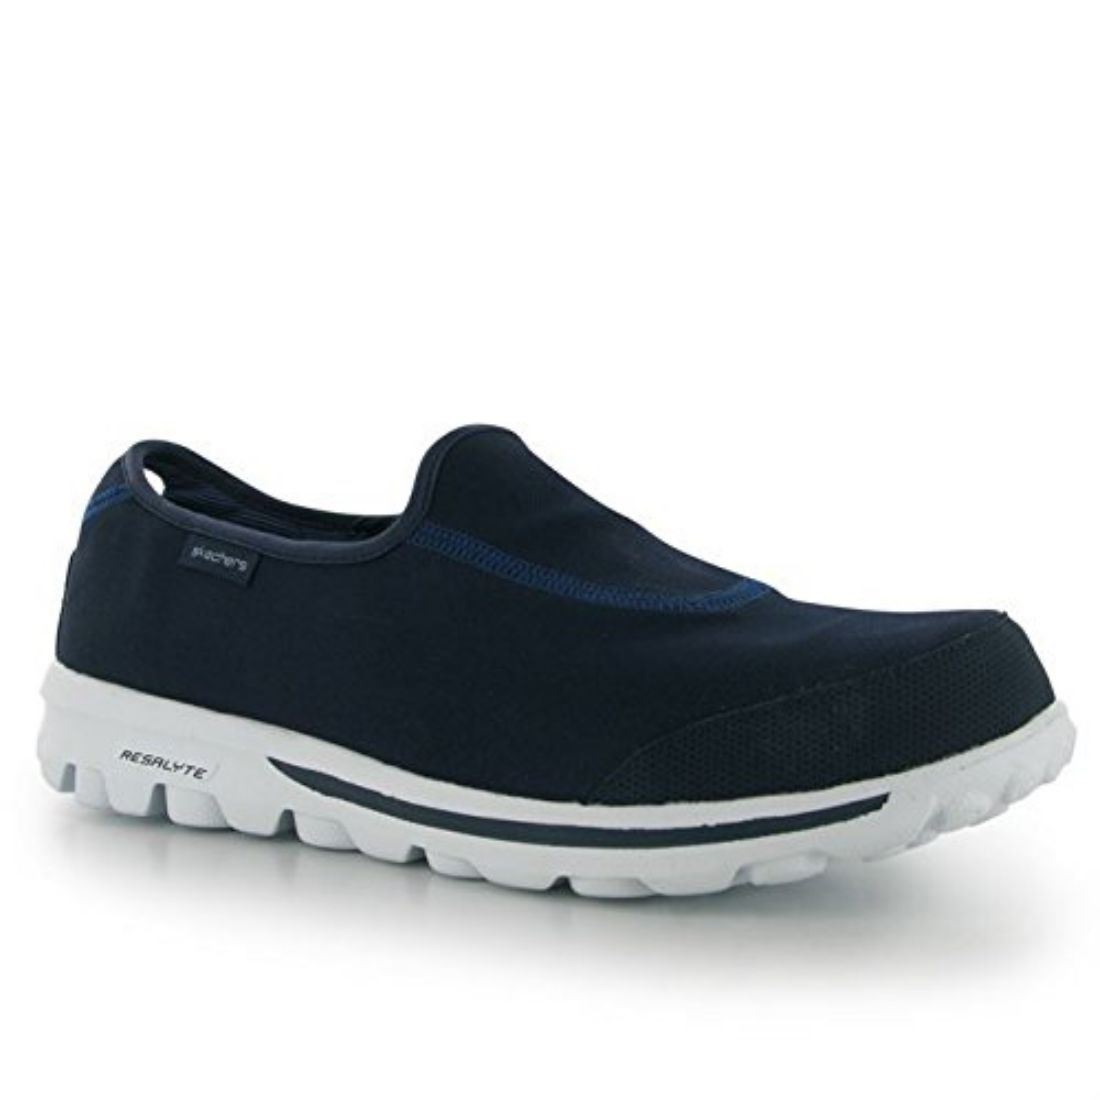 Skechers Go Walk  Mens Shoes